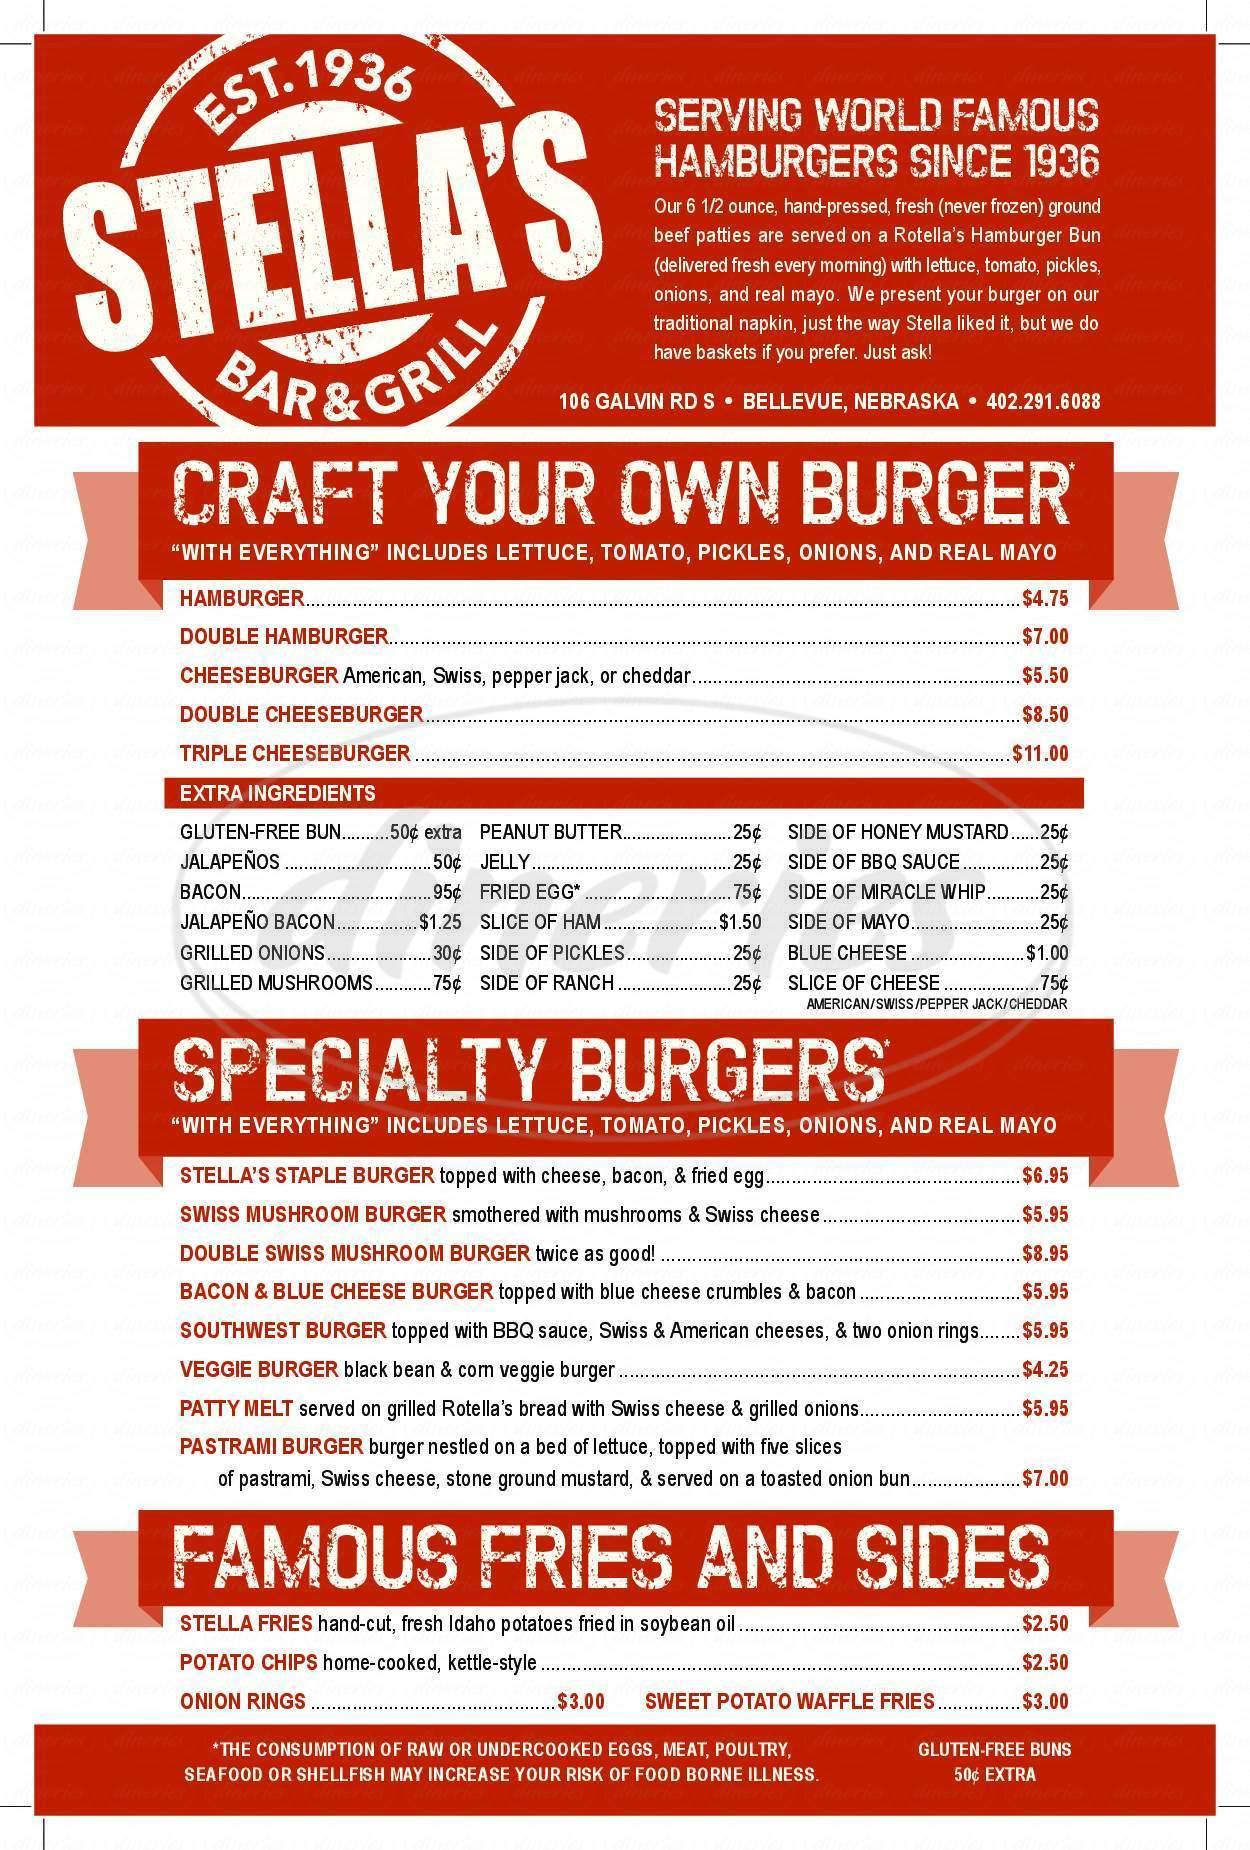 menu for Stella's Bar & Grill